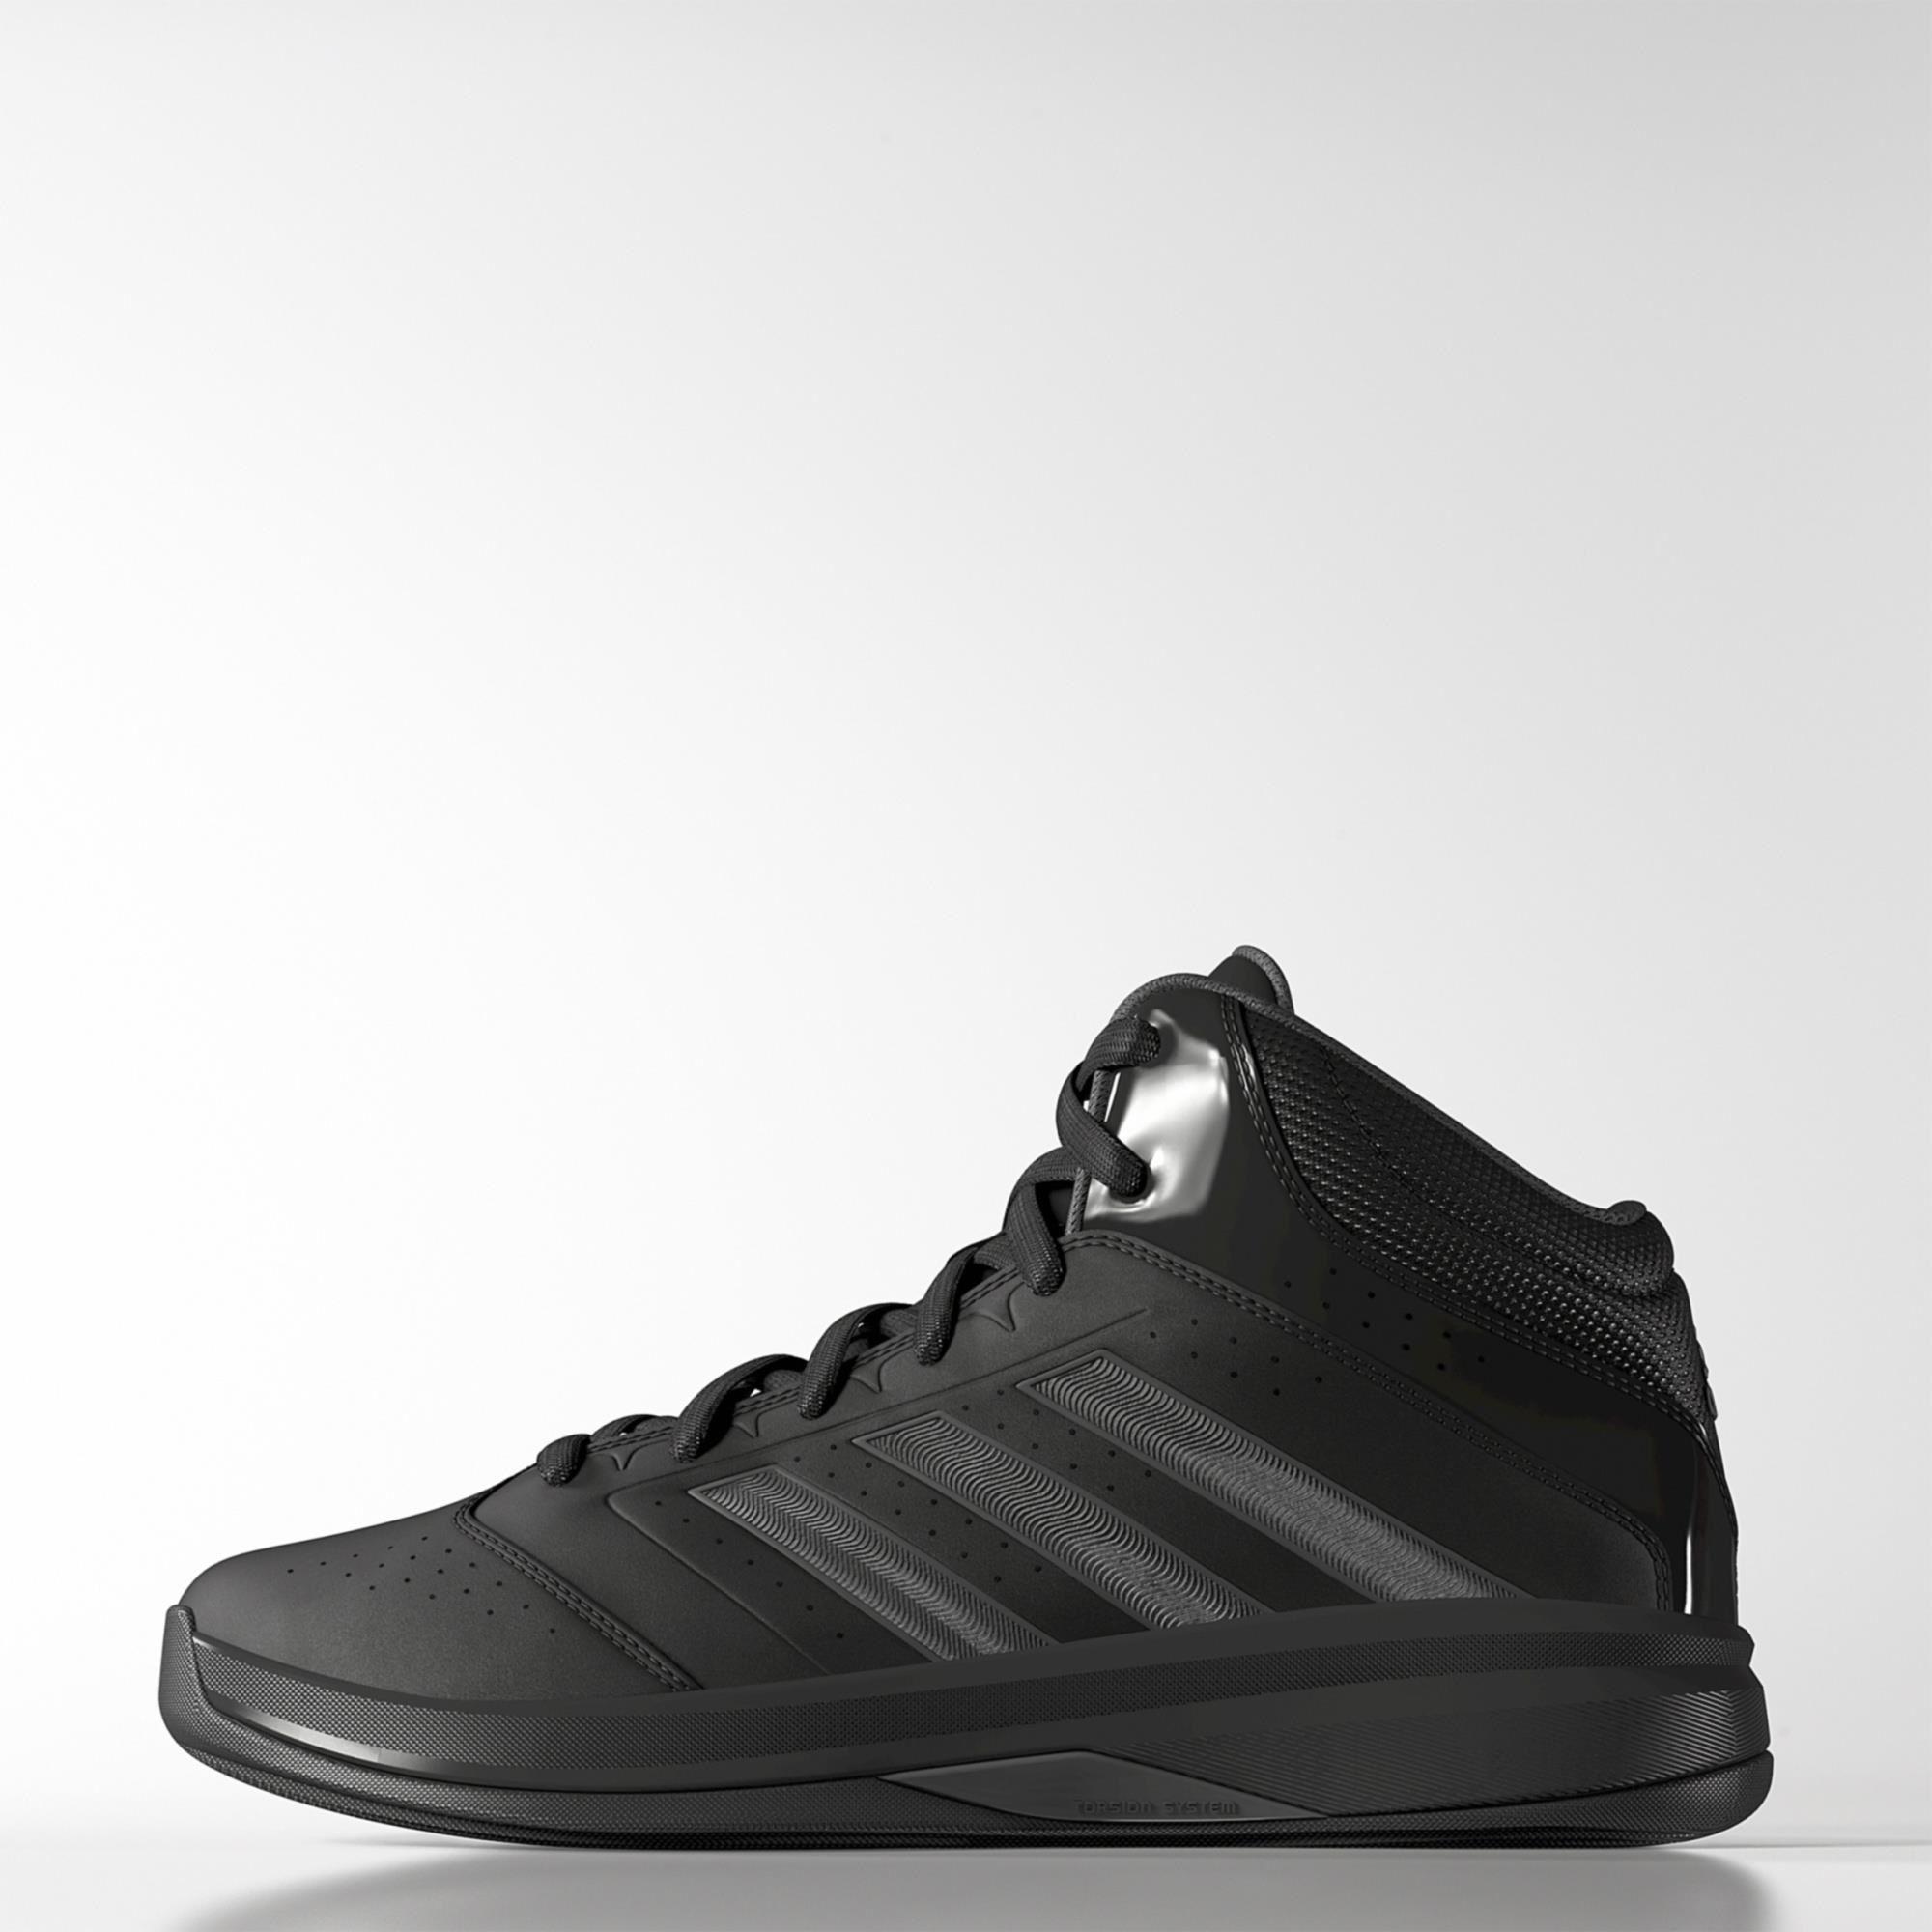 22 Adidas 5 Basketball Tallas 2 Isolation S85006 Kids Al 0 19 qPTqzA